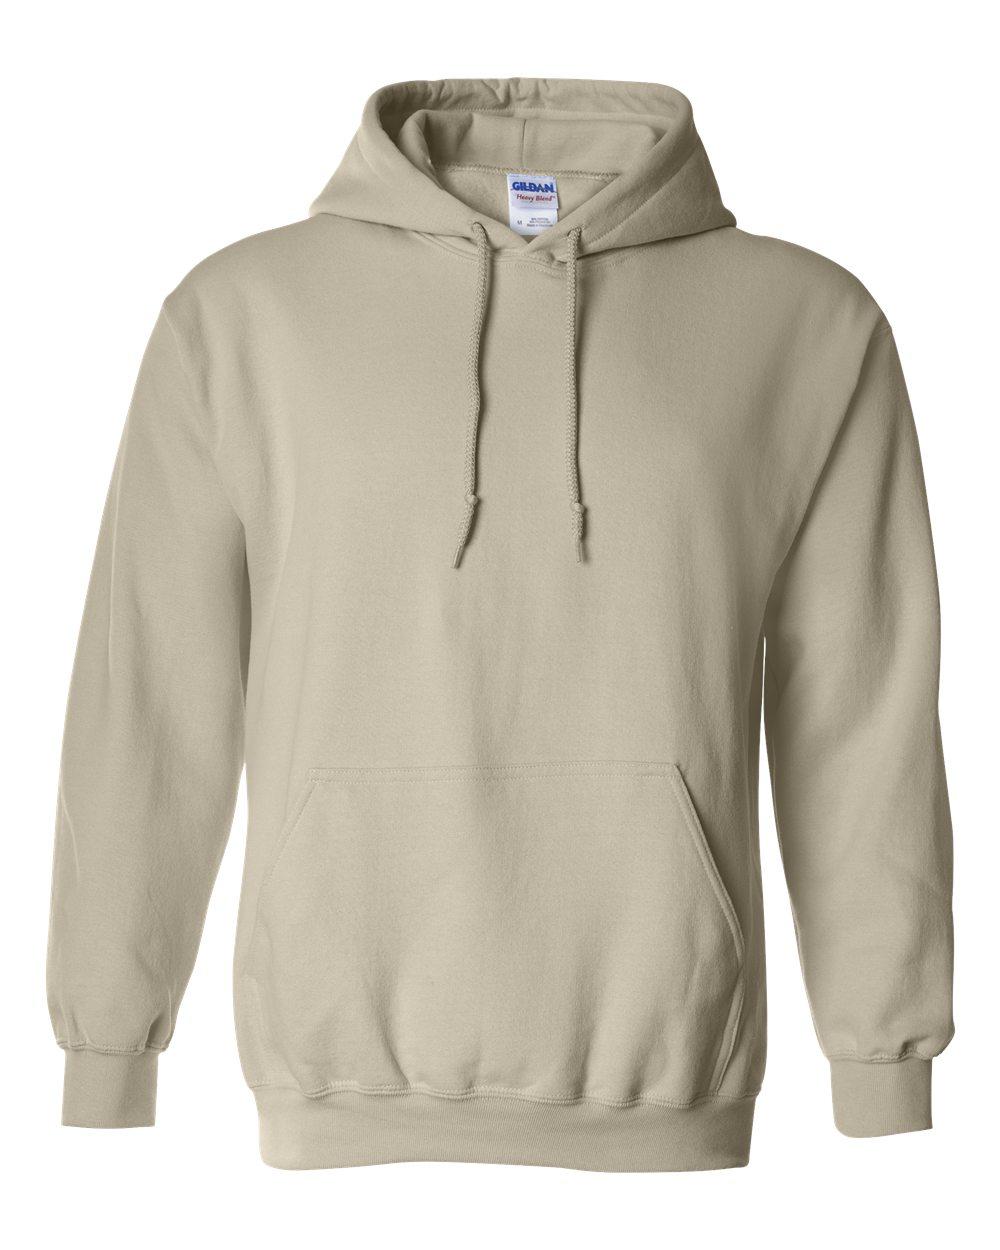 Gildan-Mens-Blank-Hoodie-Heavy-Blend-Hooded-Sweatshirt-Solid-18500-up-to-5XL thumbnail 89